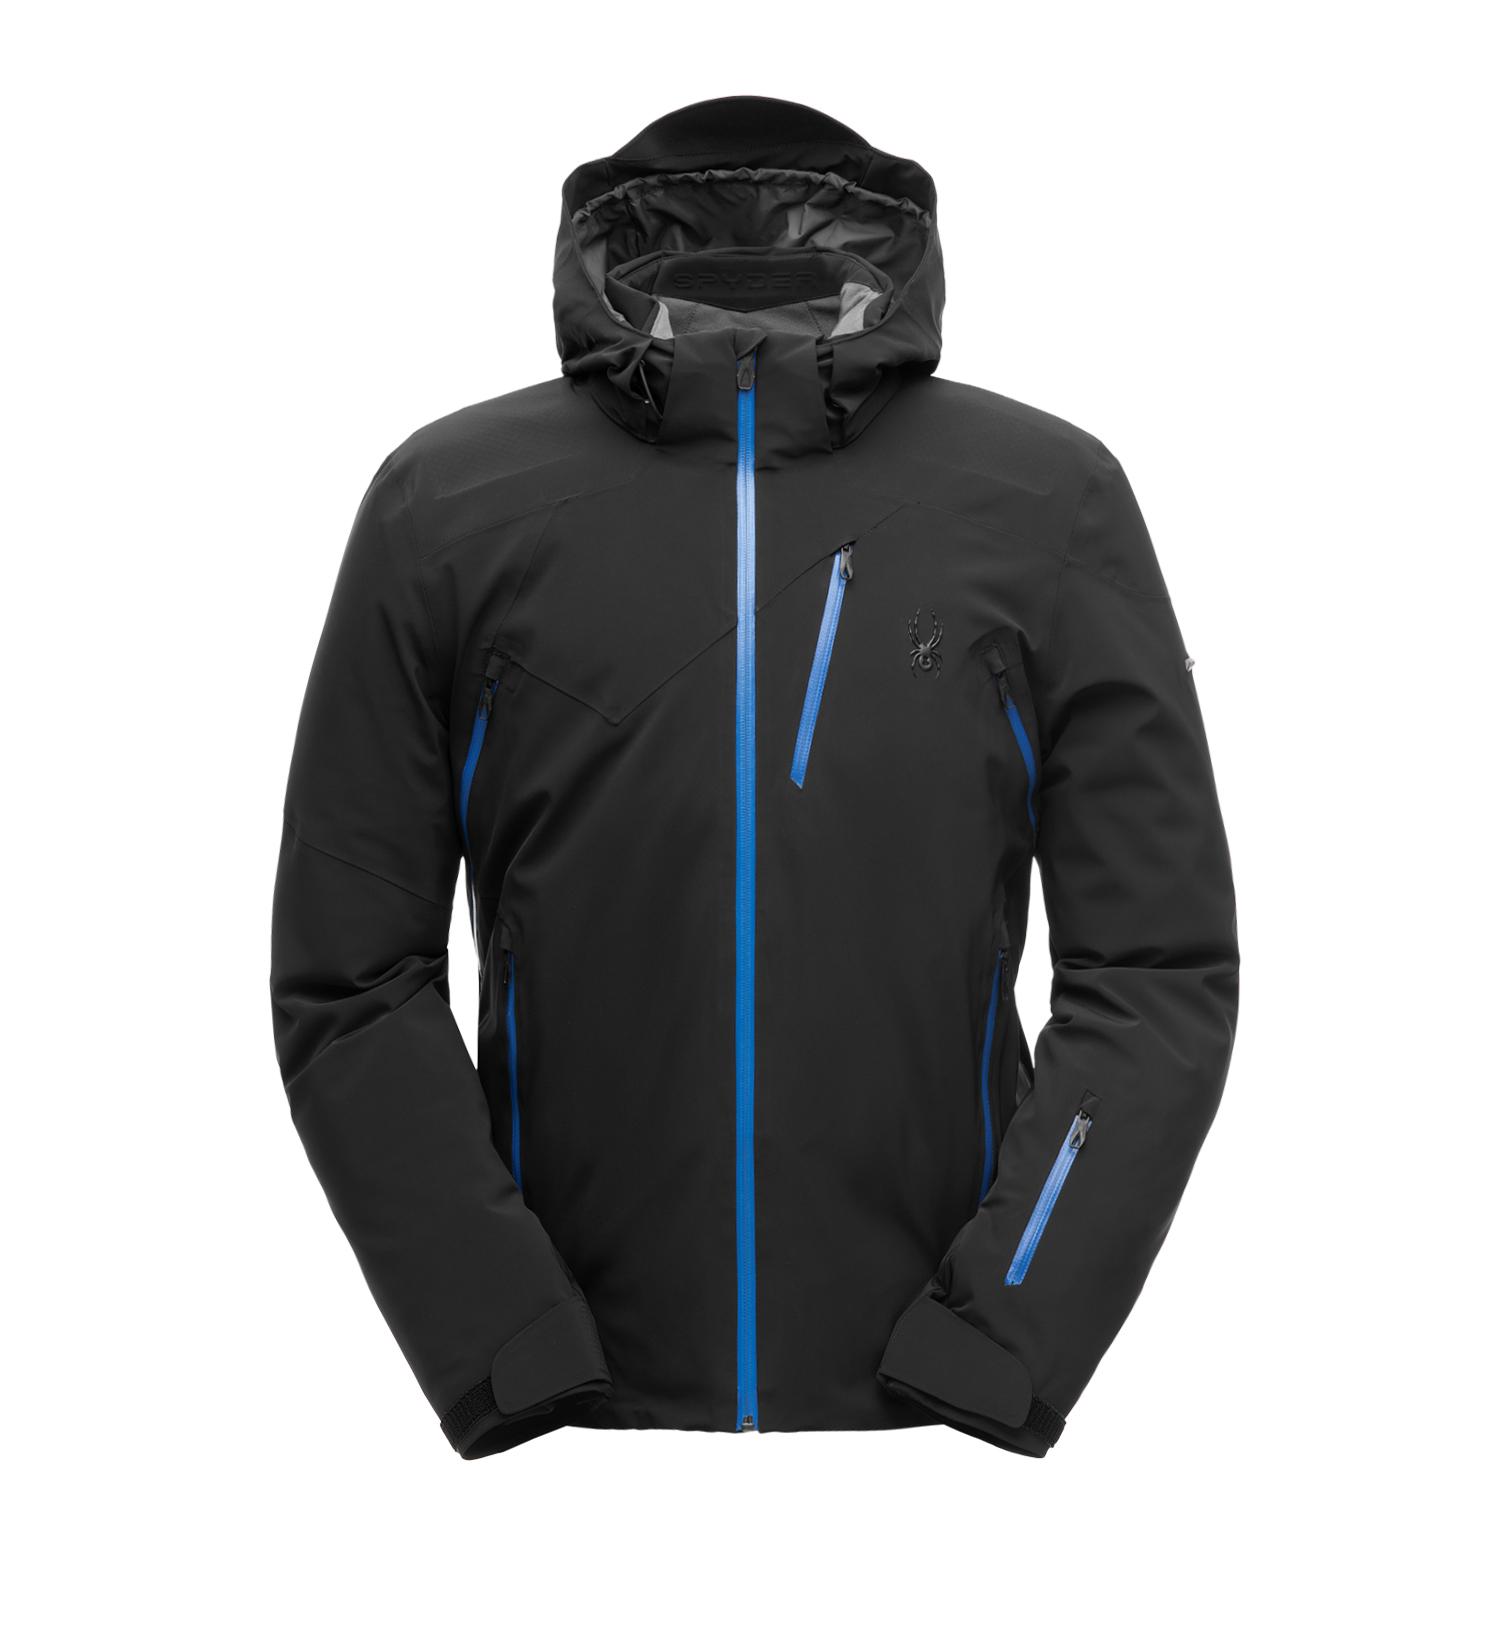 half off 7e0e7 a41a9 Spyder M Cordin GTX Jacket - Herren Gore-Tex Skijacke Snowboardjacke -  181710-001 schwarz/blau